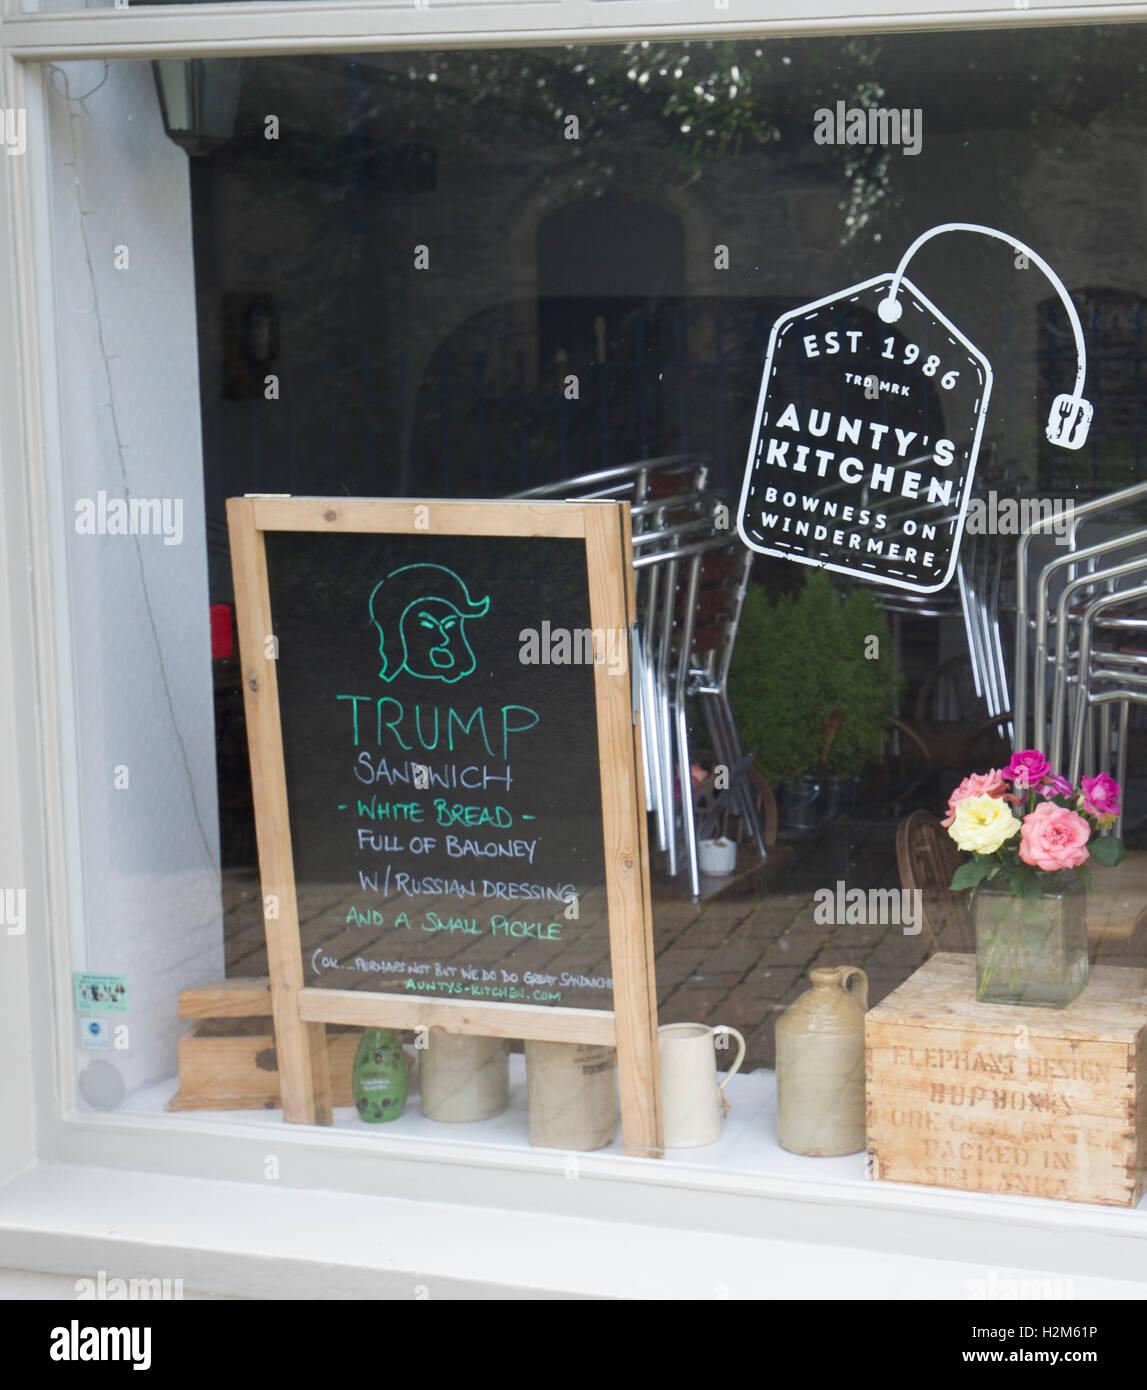 Cumbria UK 30. September UK Bowness auf Windermere Dorf. Café ...